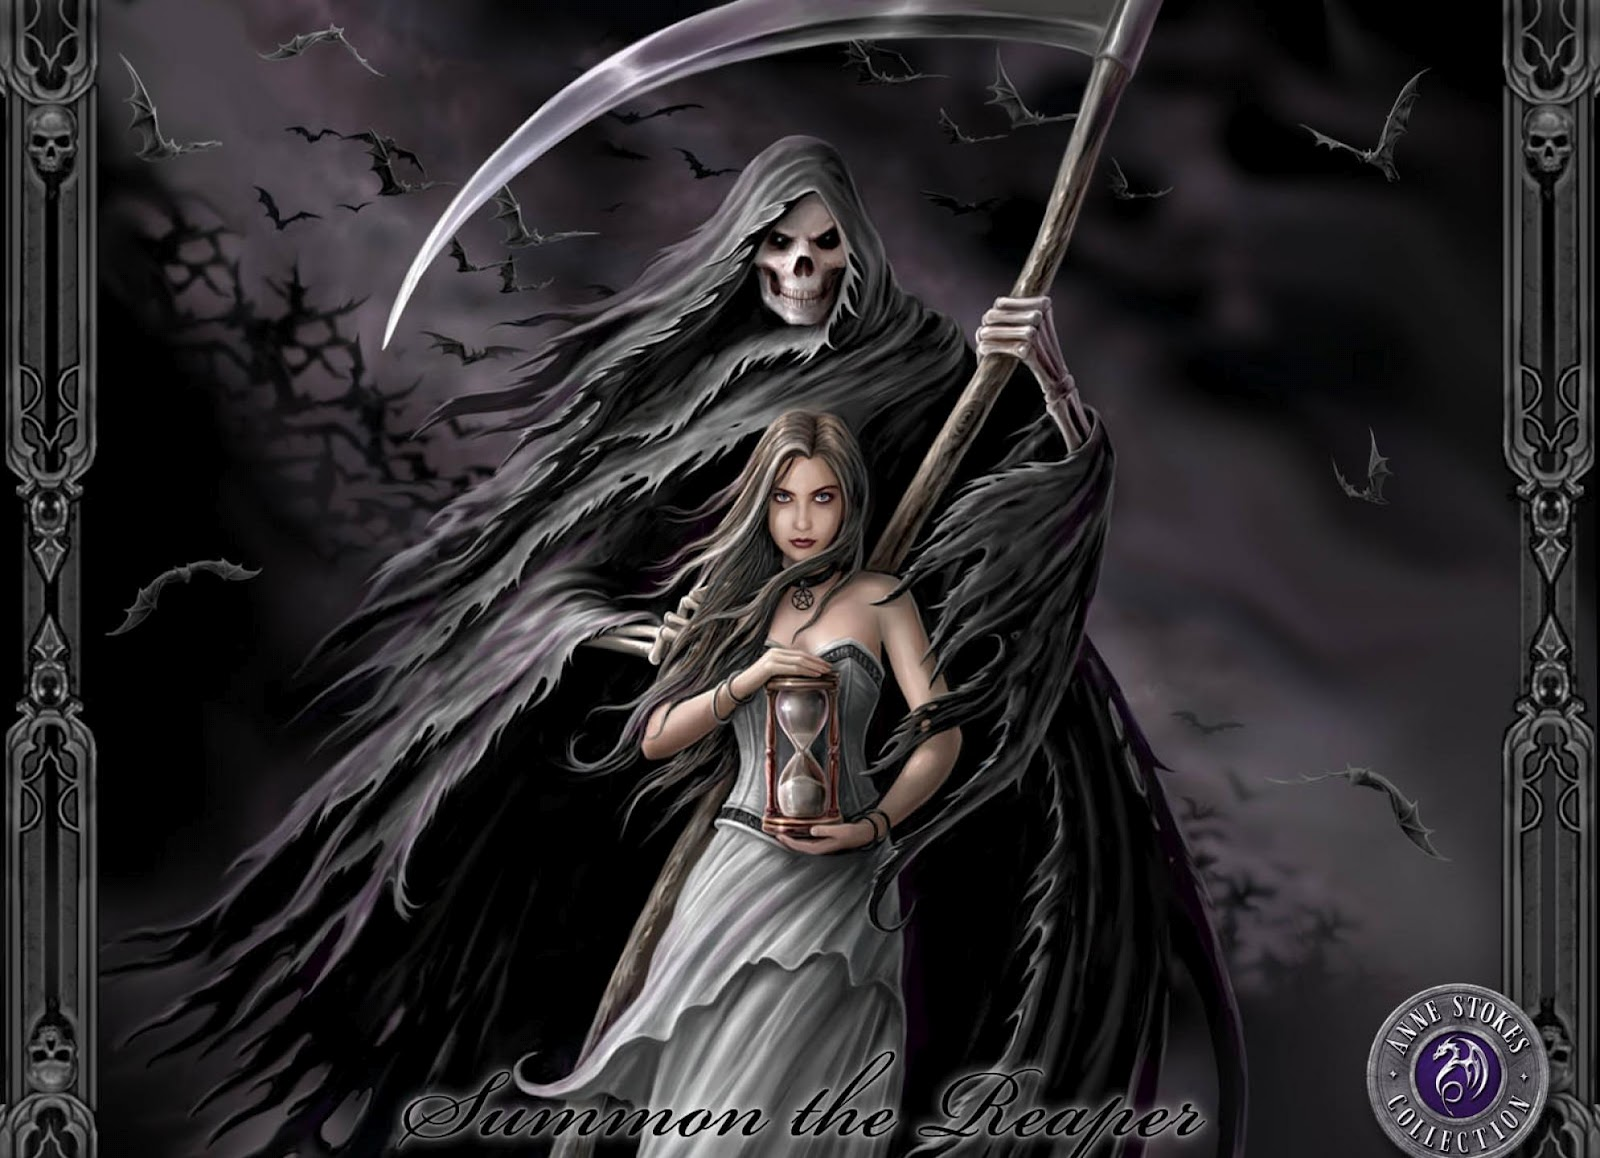 Free Download Digital Hd Wallpapers Dark Fantasy Horror Wallpapers